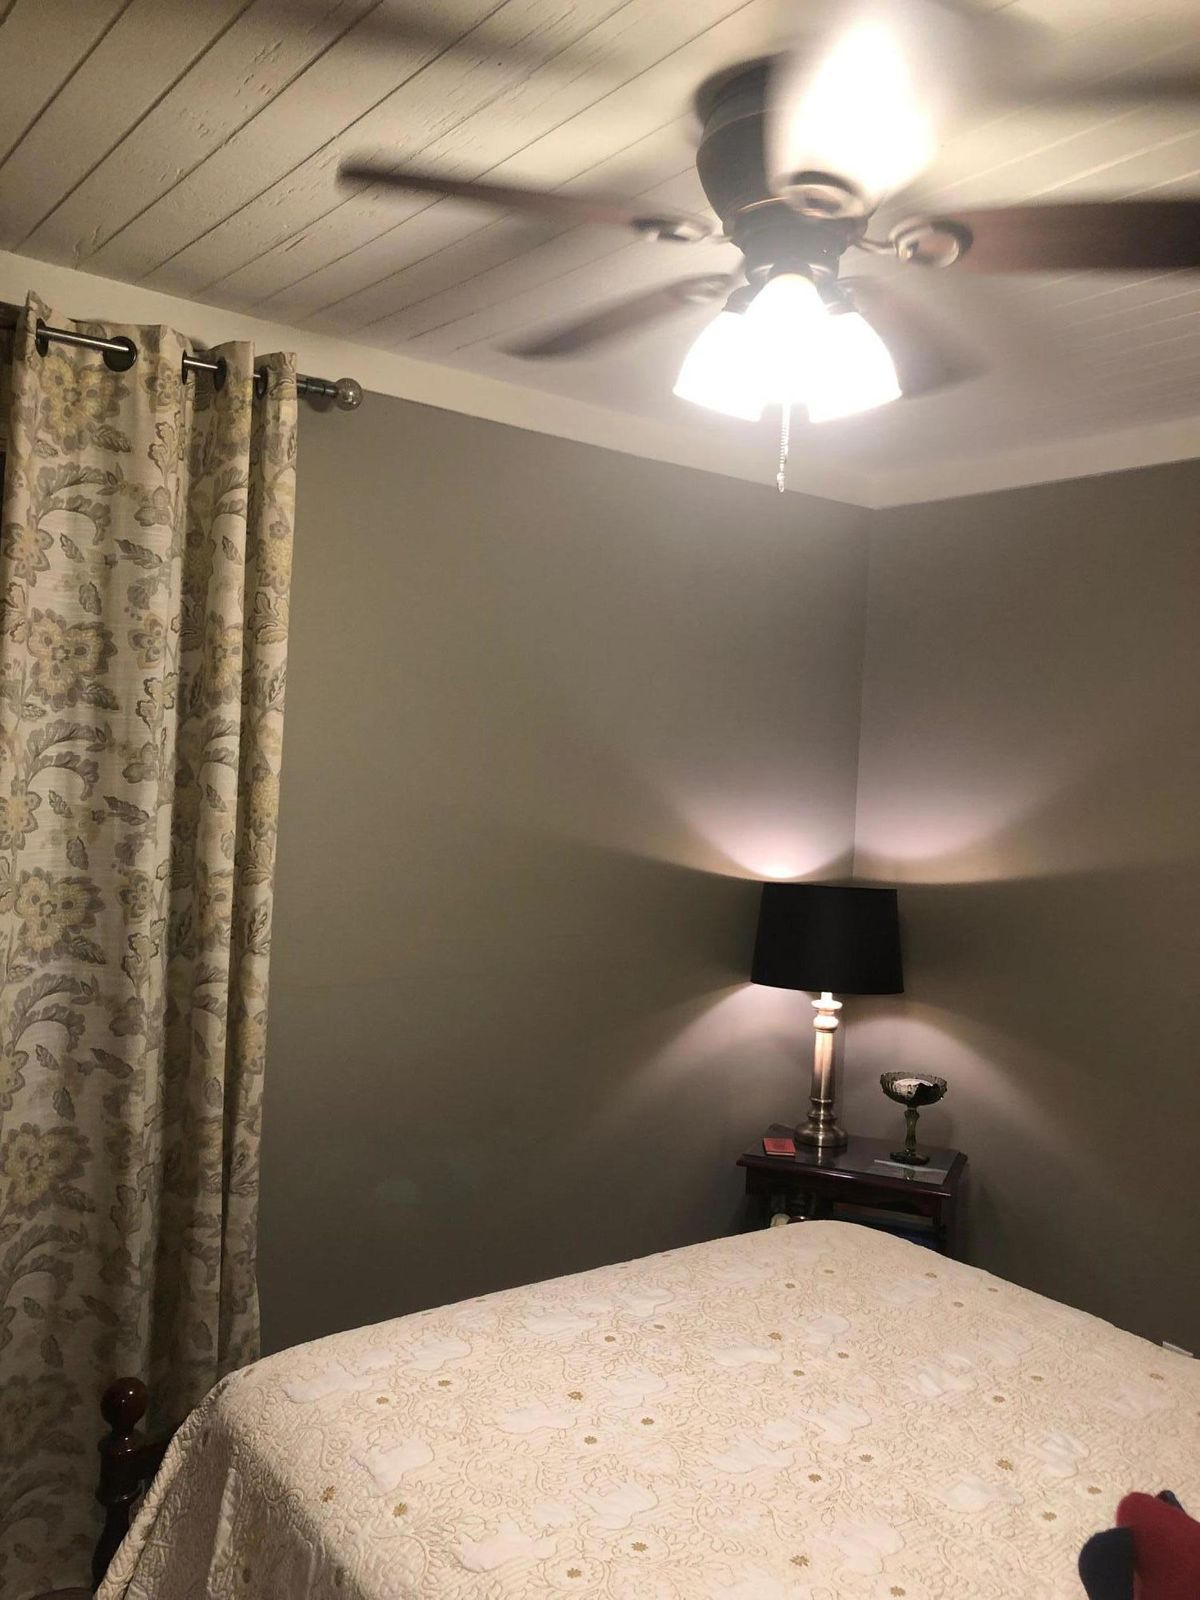 BEDROOM 2 opposite wall view